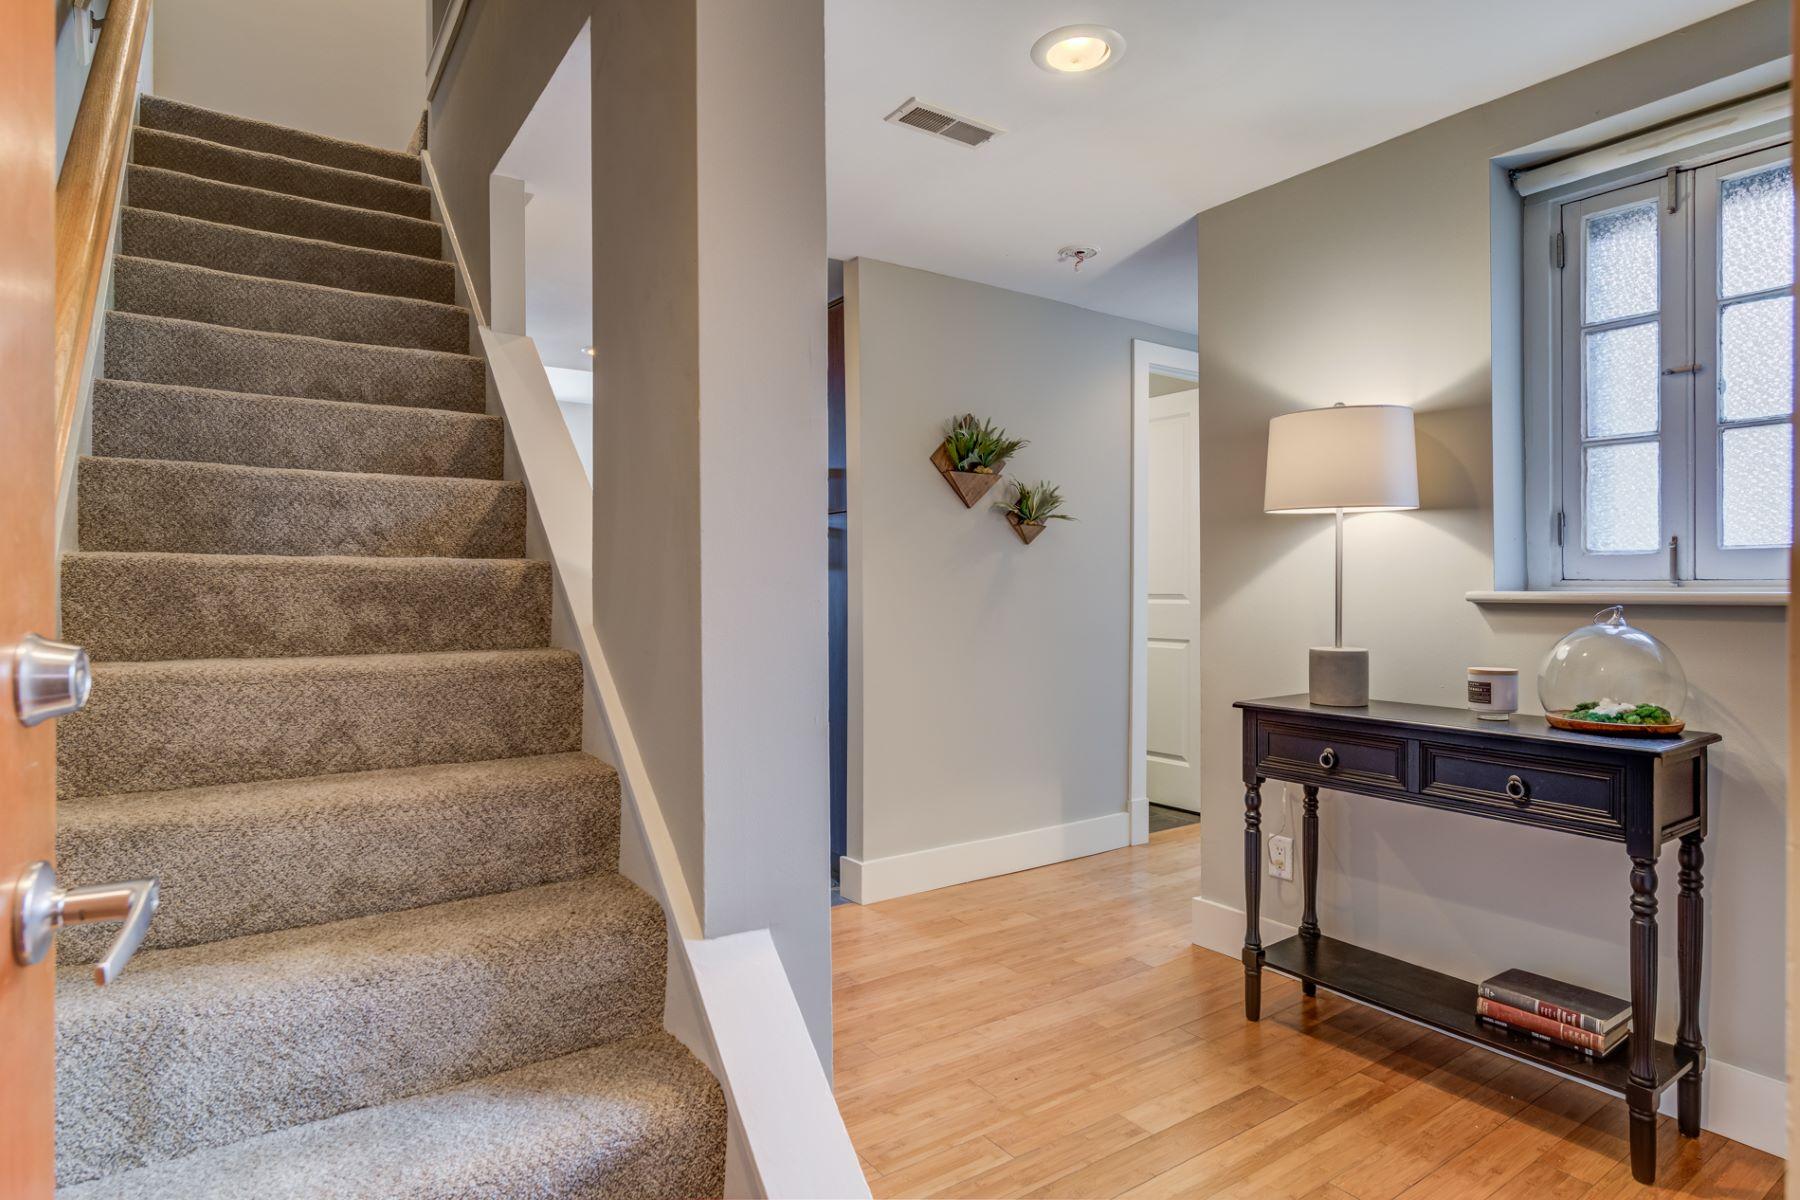 Additional photo for property listing at Westgate Ave 601 Westgate Ave # 601C University City, Missouri 63130 United States